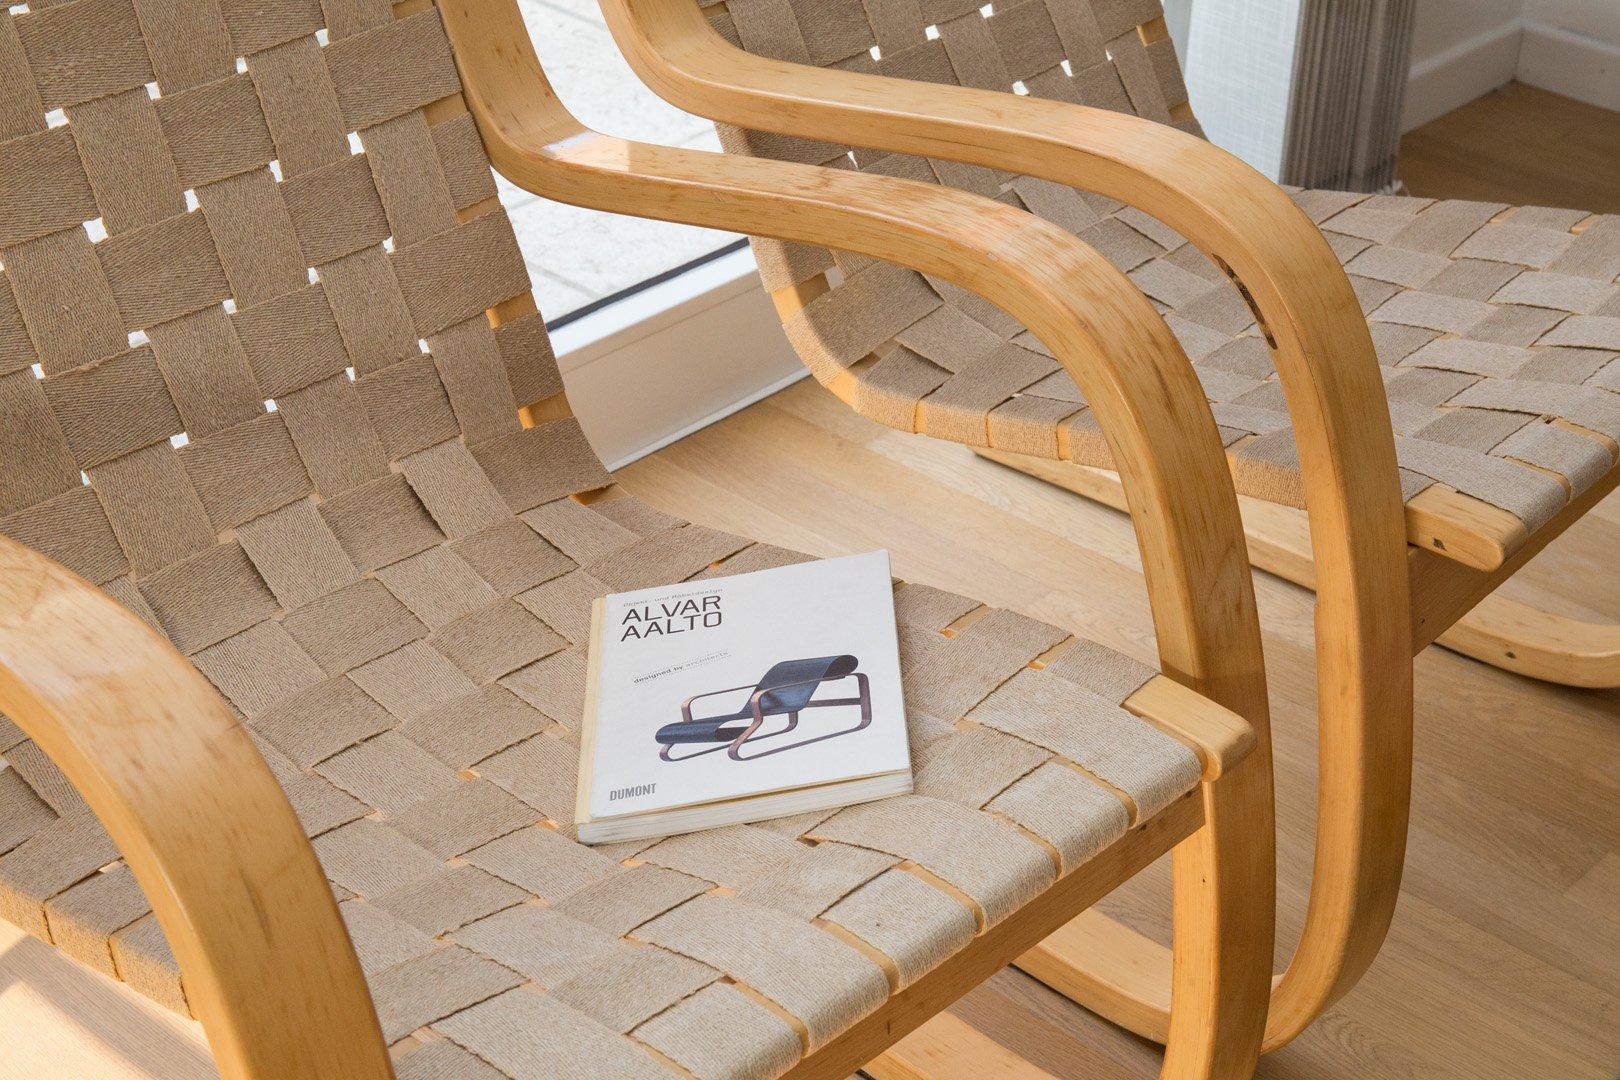 Birch Model 406 Chairs By Alvar Aalto For Artek For Sale